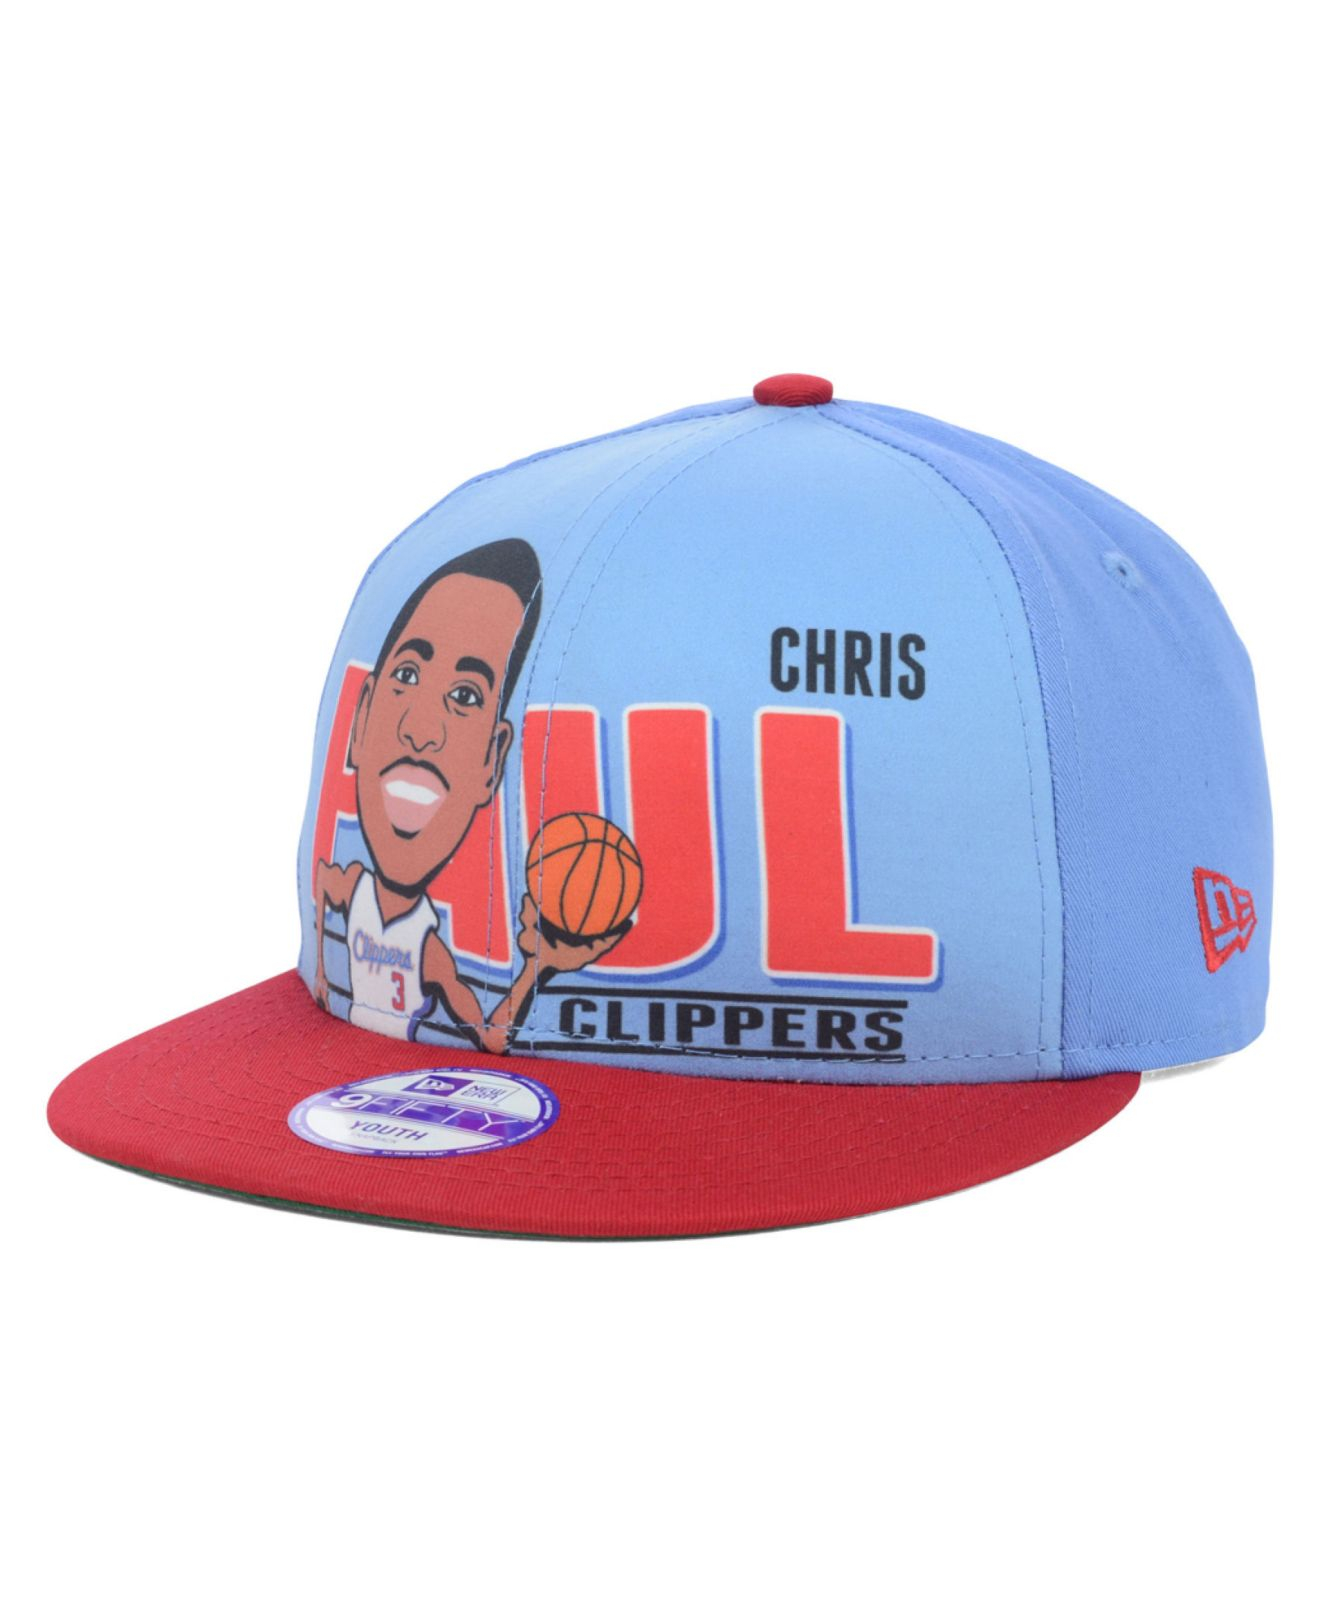 09dd1bfbffc ... nba basketball hat new era 9fifty snapback cap blue red f47d6 1ecf6   cheap lyst ktz kids chris paul los angeles clippers player 9fifty bfb83  05ab7